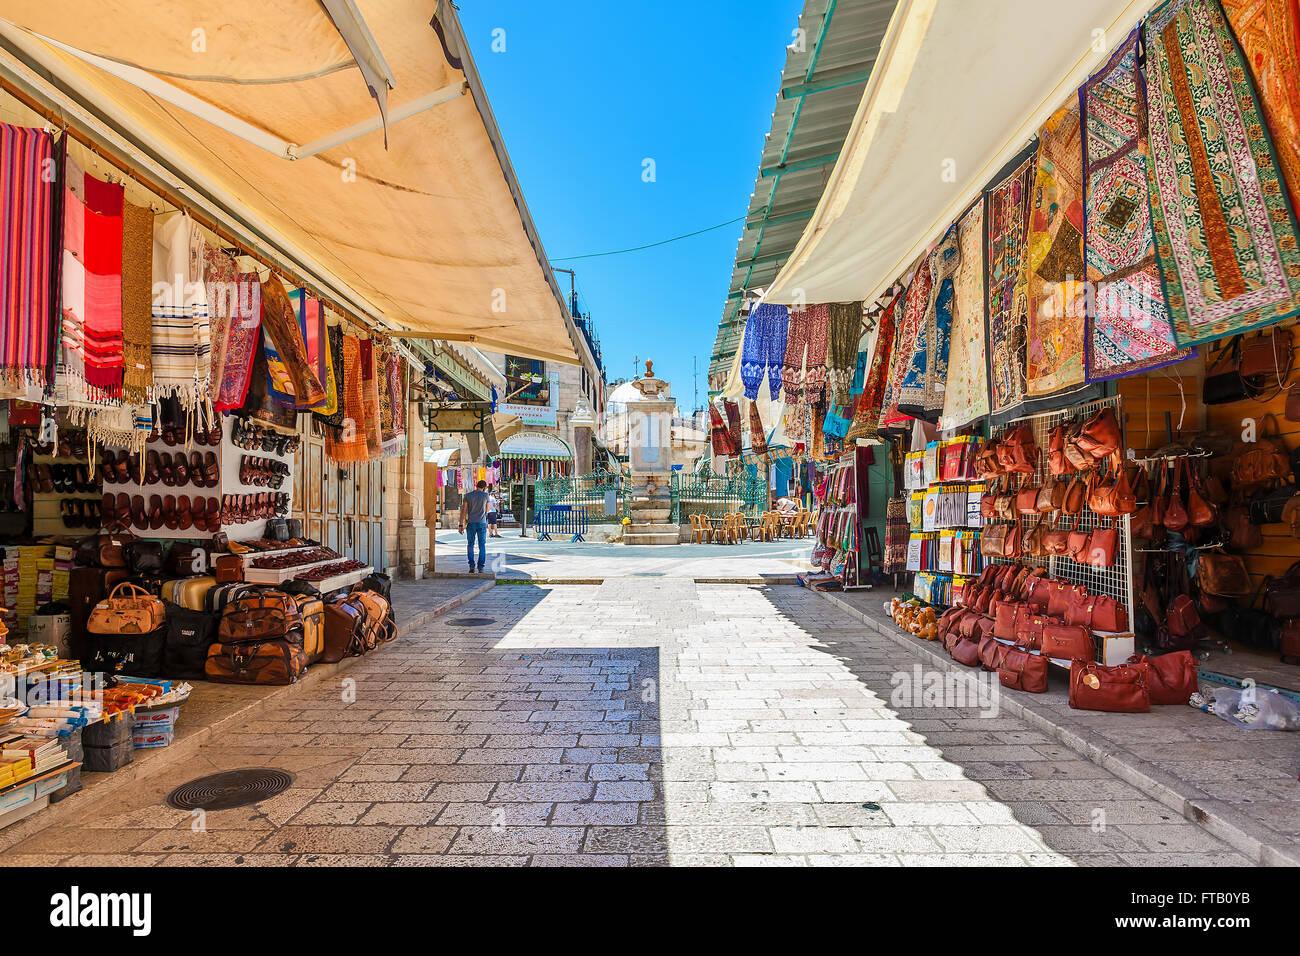 Bazaar nella Città Vecchia di Gerusalemme, Israele. Immagini Stock